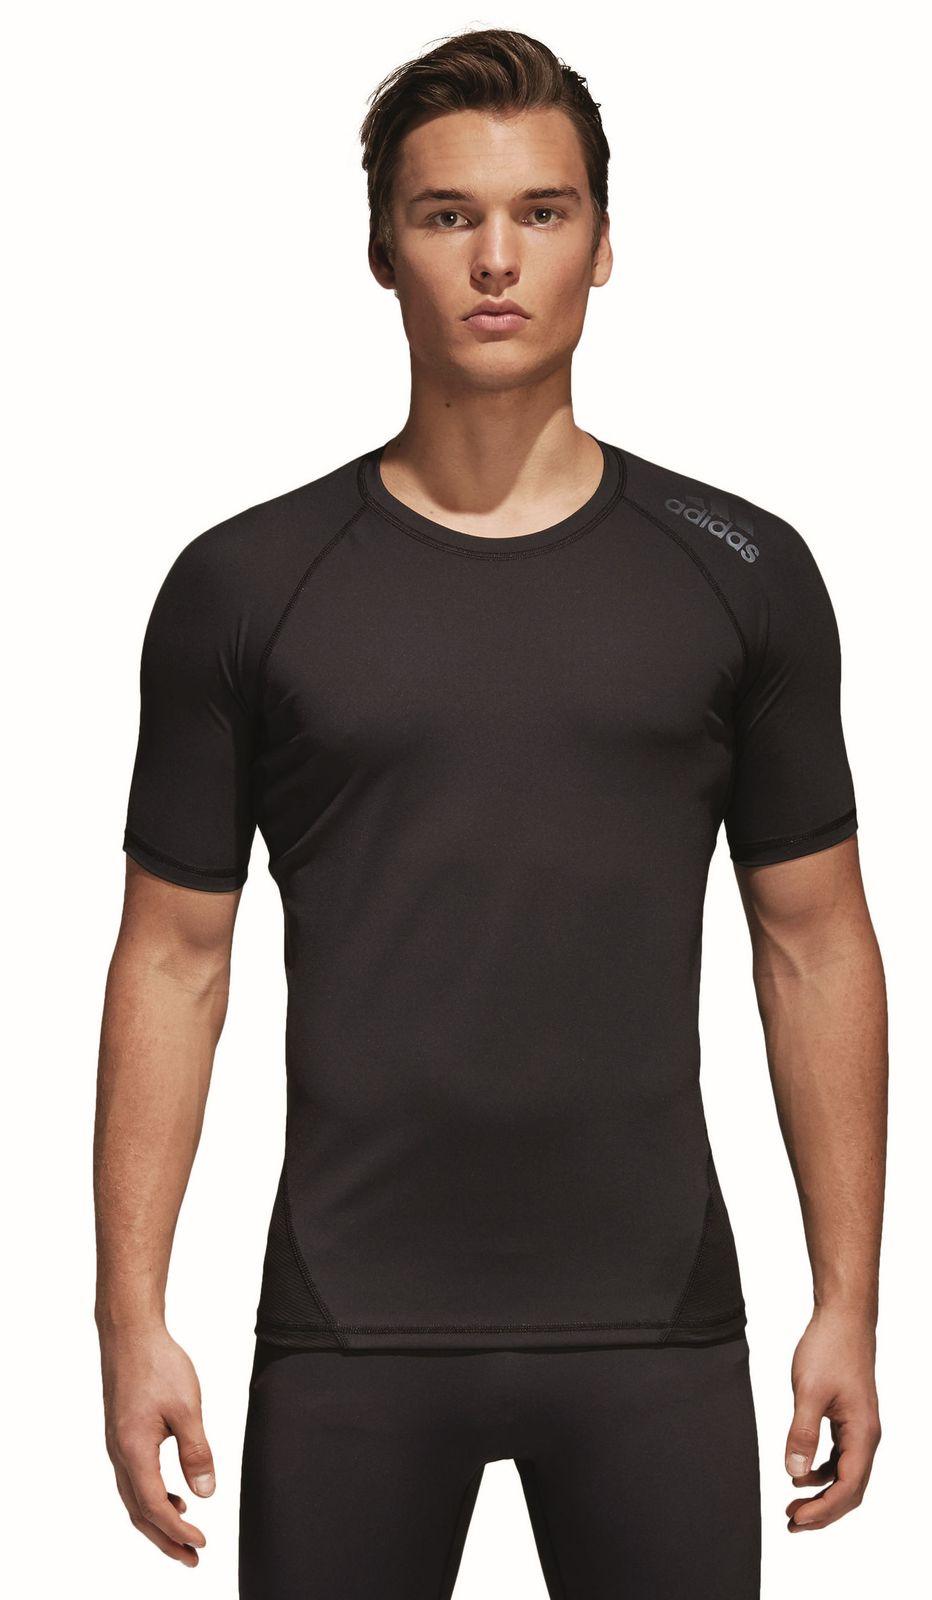 adidas herren fitness sport shirt alphaskin compression t shirt uv 50 schwarz. Black Bedroom Furniture Sets. Home Design Ideas